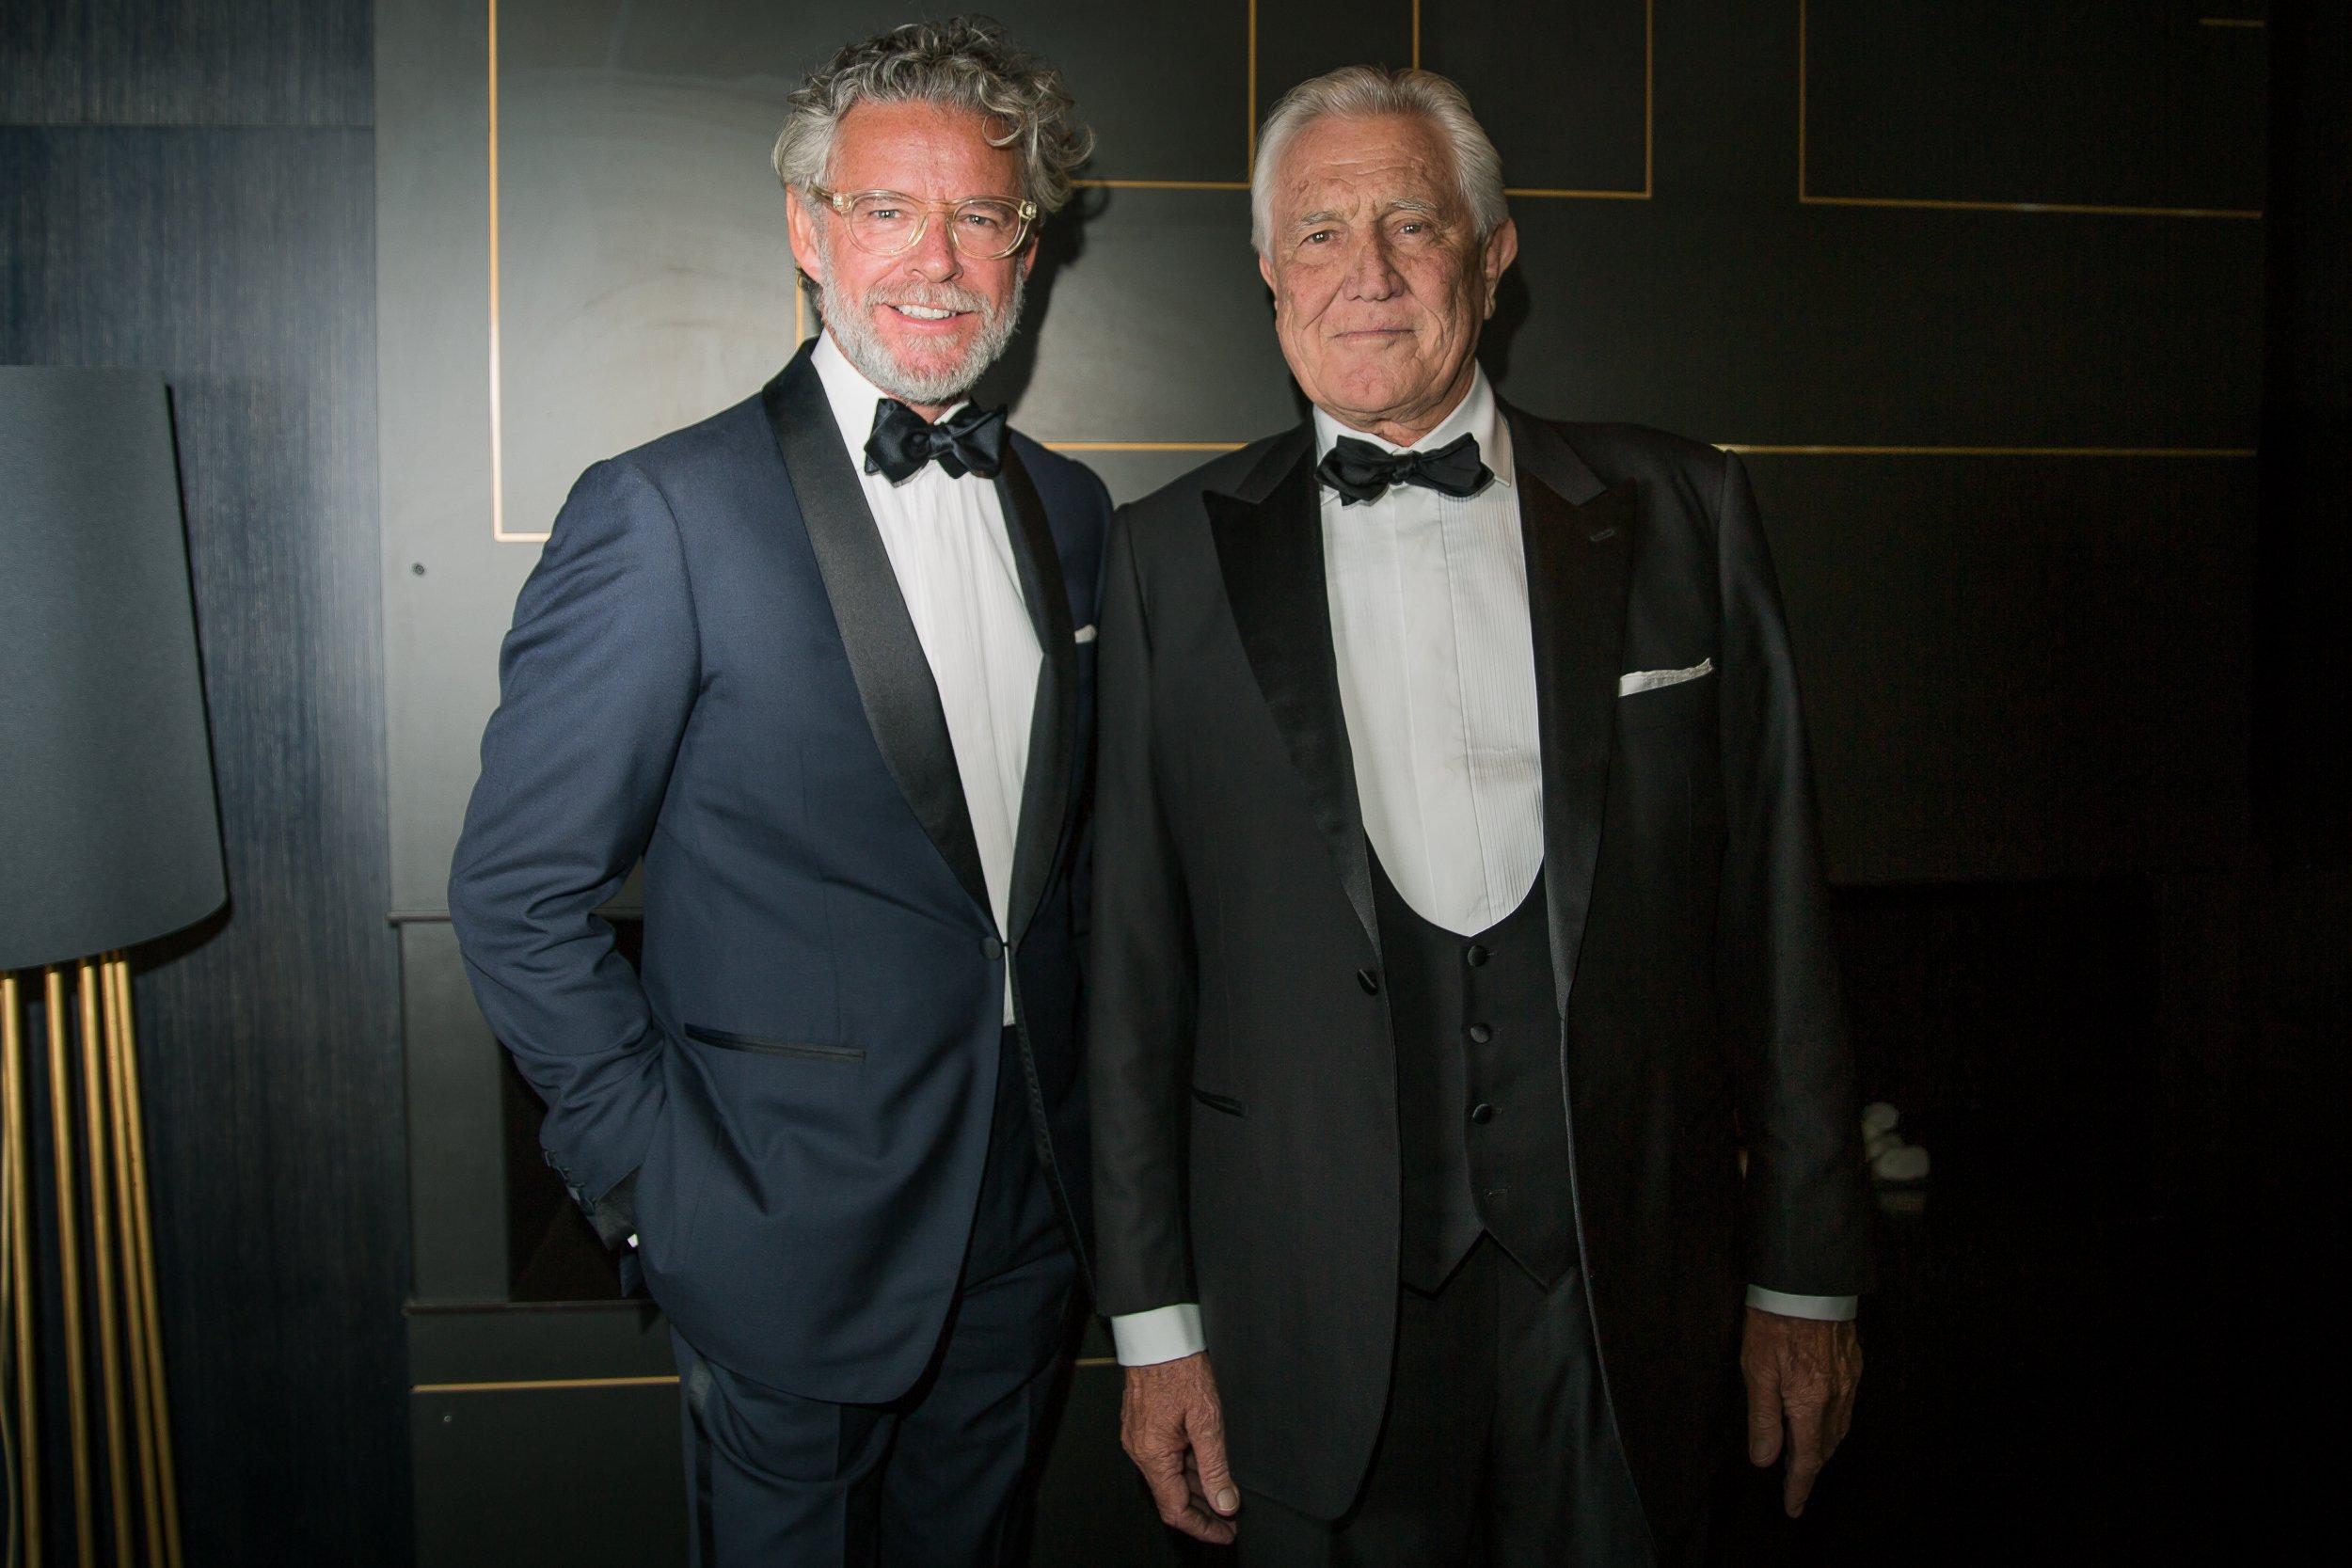 James-Bond-Oslo-David-Mason-George-Lazenby